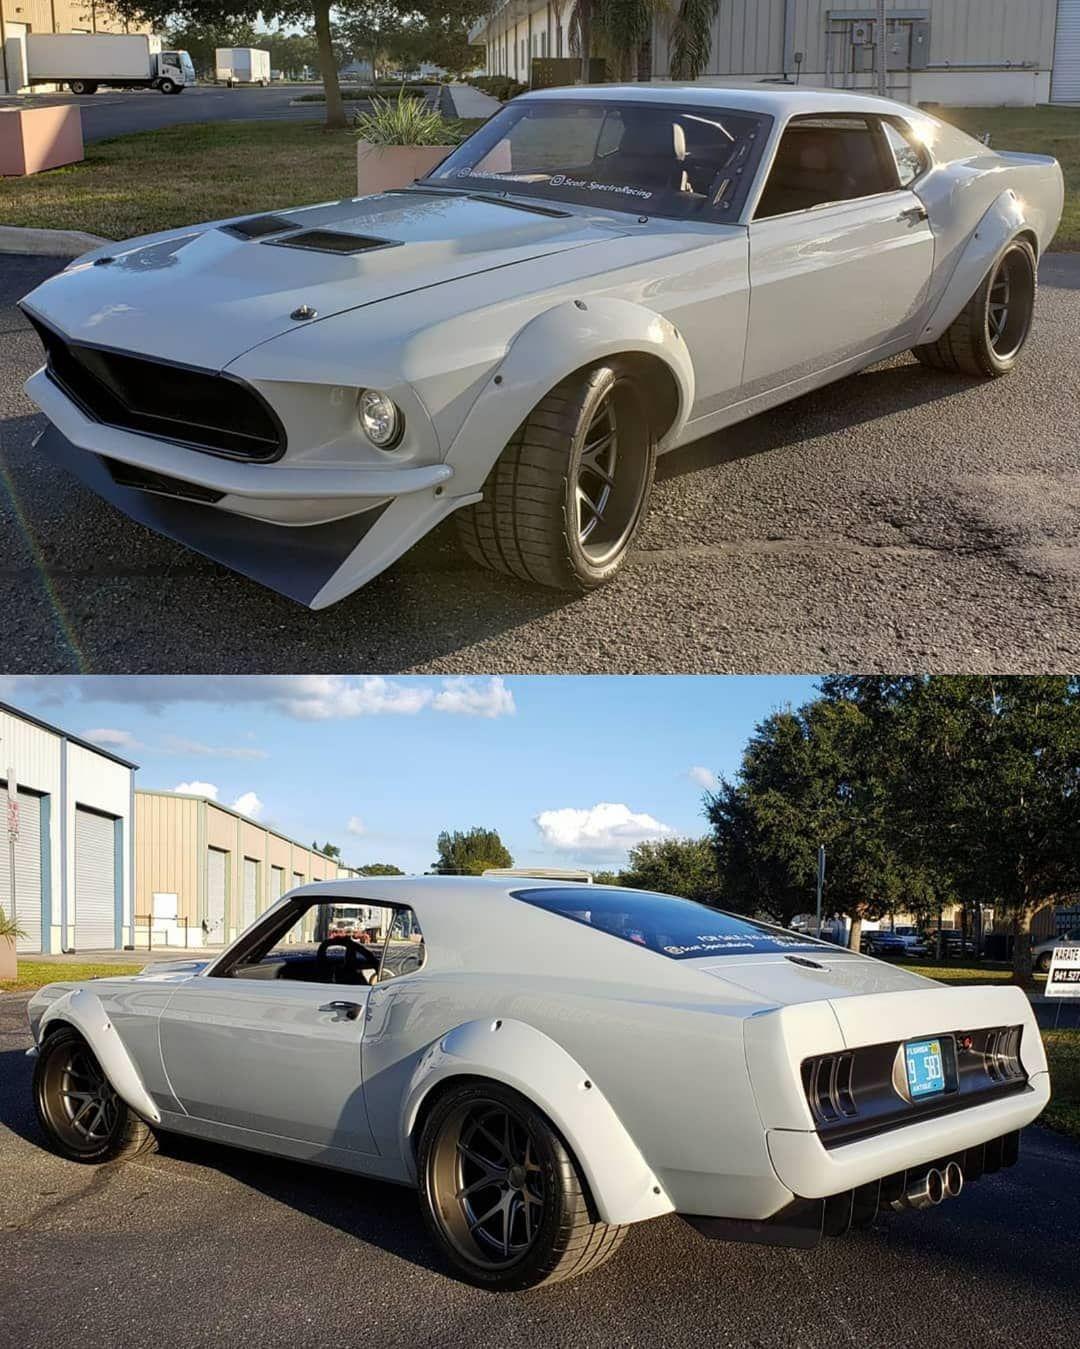 @scott_spectroracing's 1969 Mustang Built By